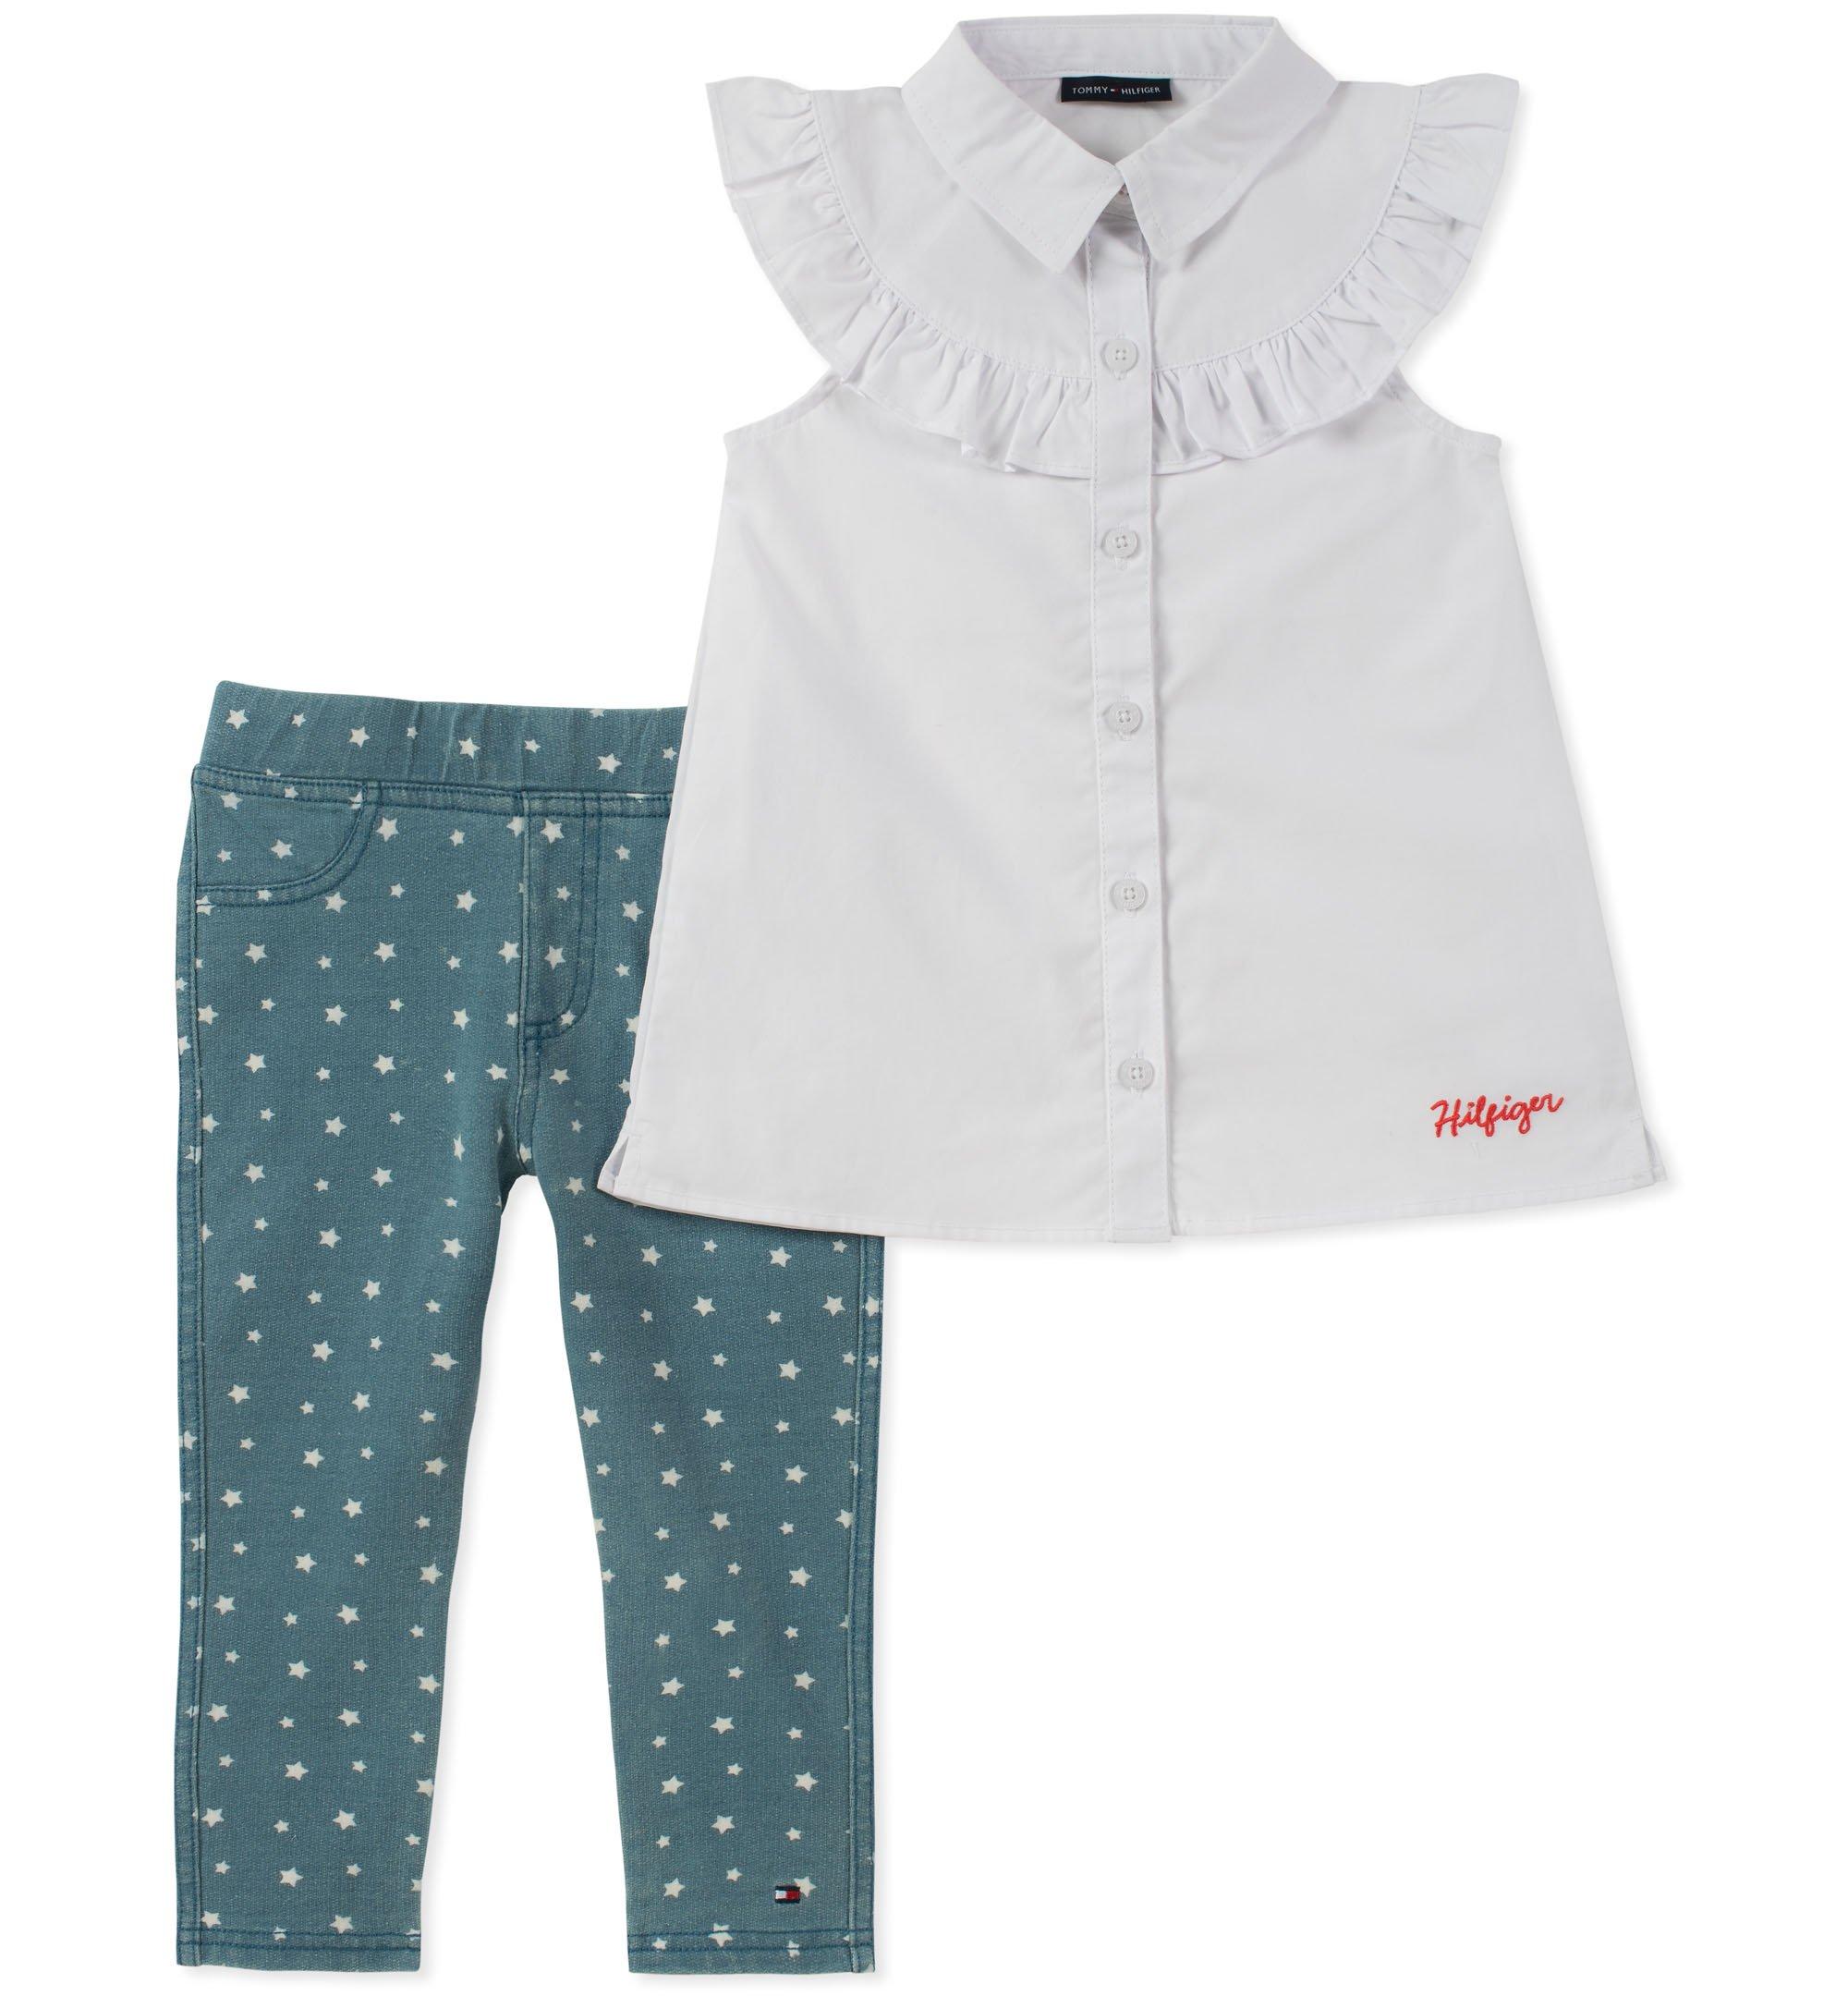 Tommy Hilfiger Toddler Girls' Tunic Set, White/Medium Blue, 4T